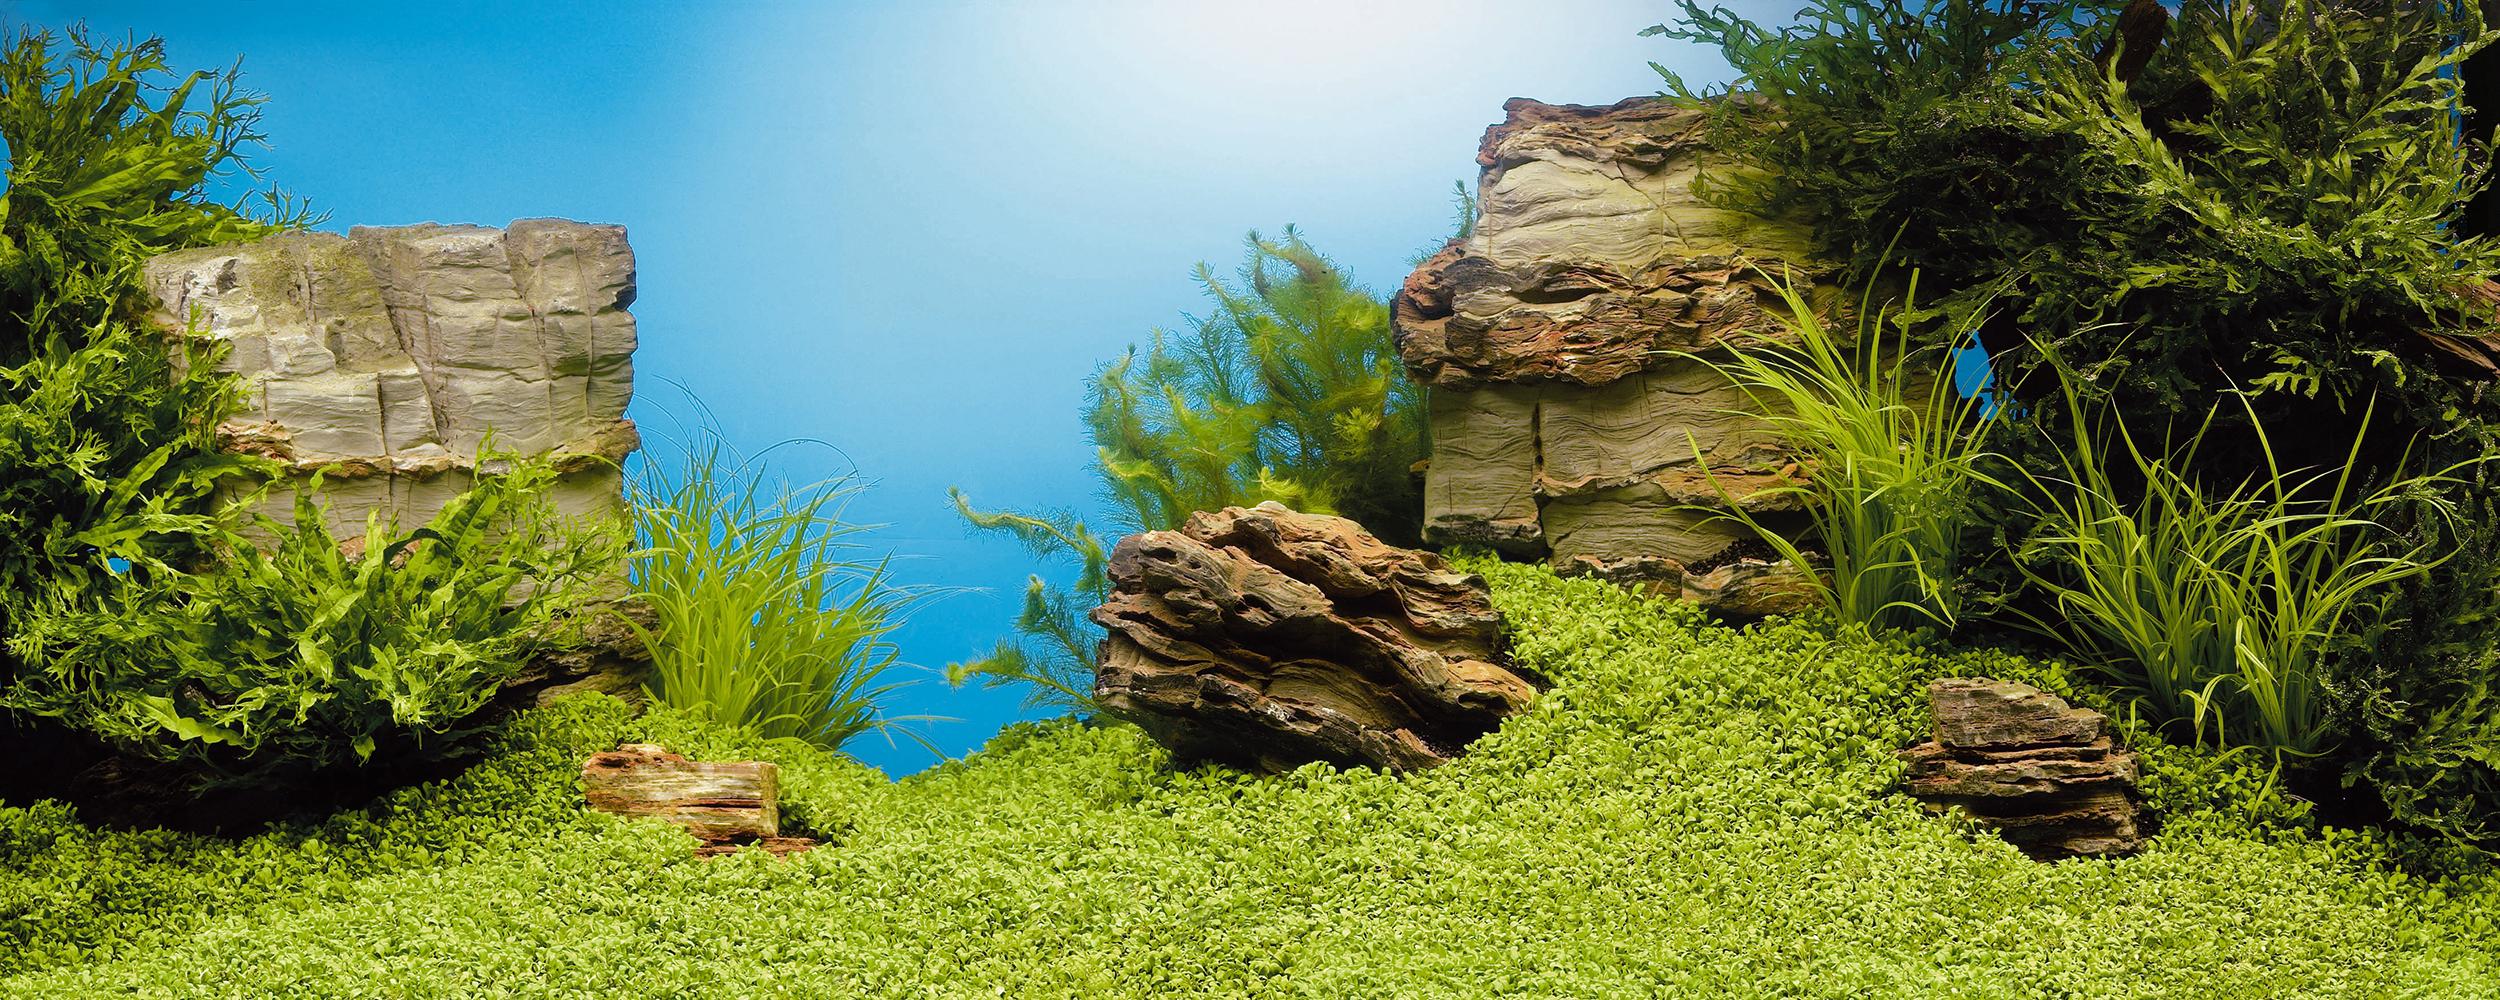 Juwel large double sided poster aquarium background l fish for Fish tank backdrop